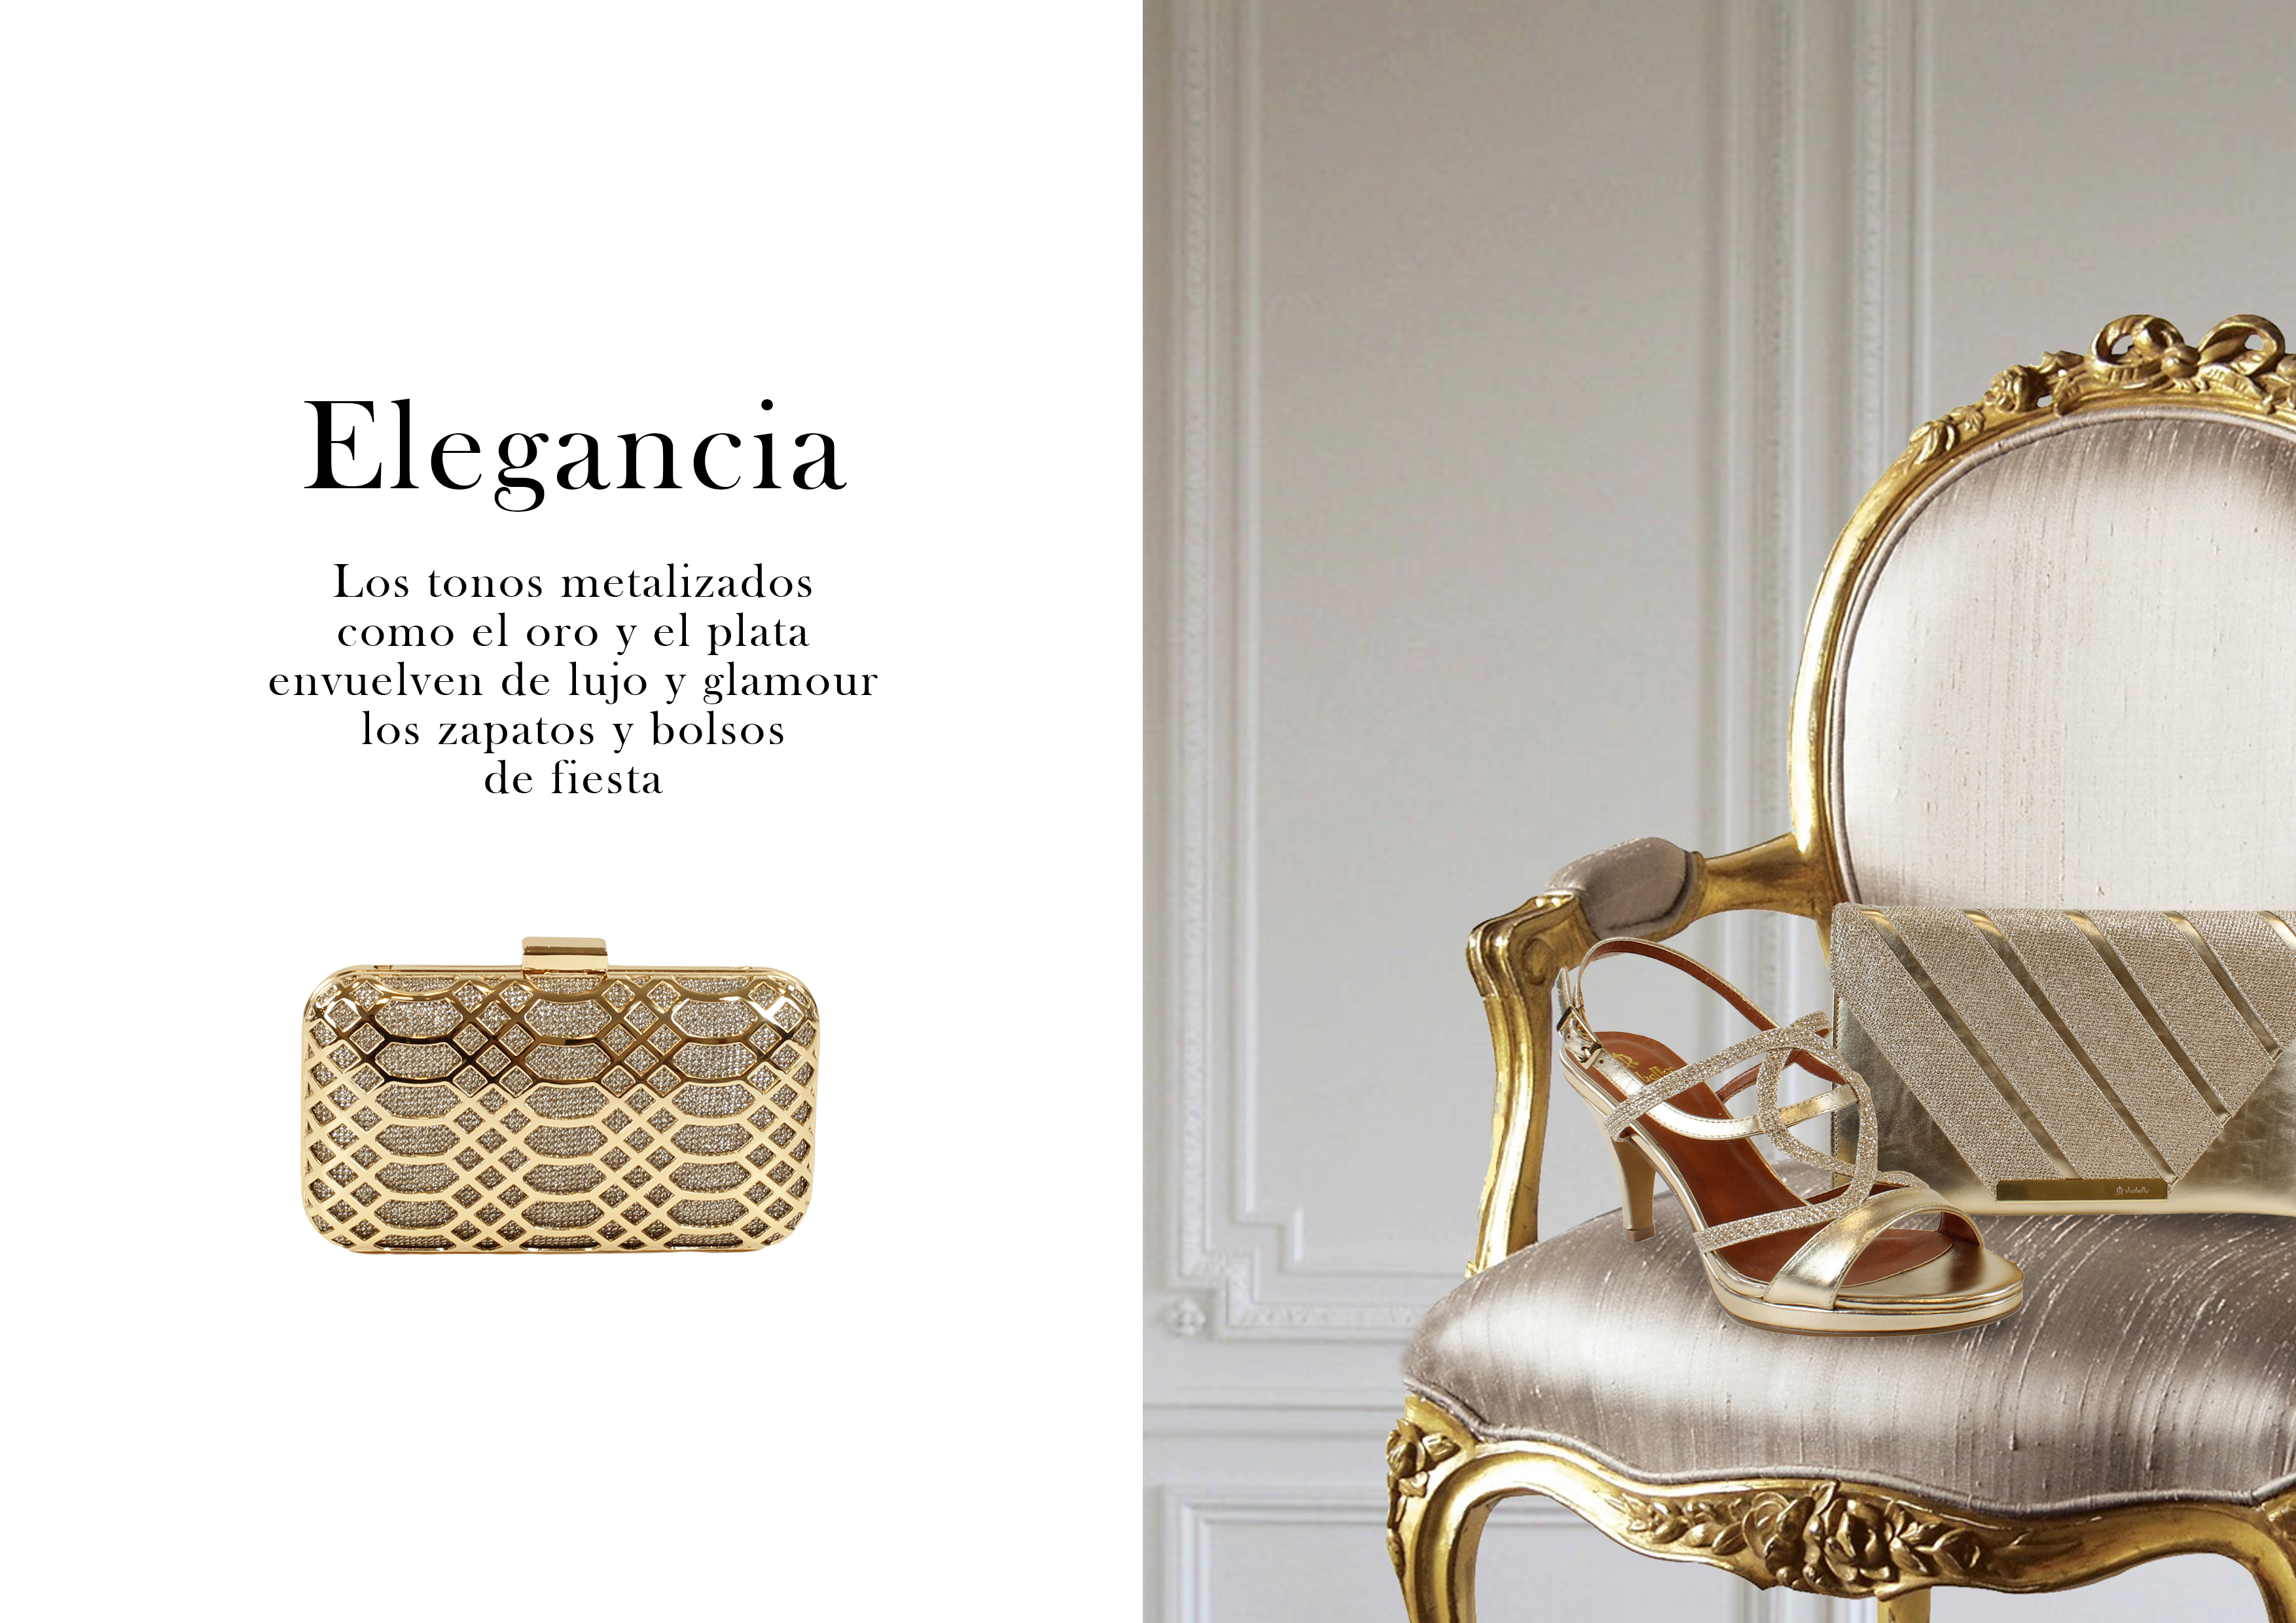 Elegancia-El Caballo Coleccion Primavera Verano 2017